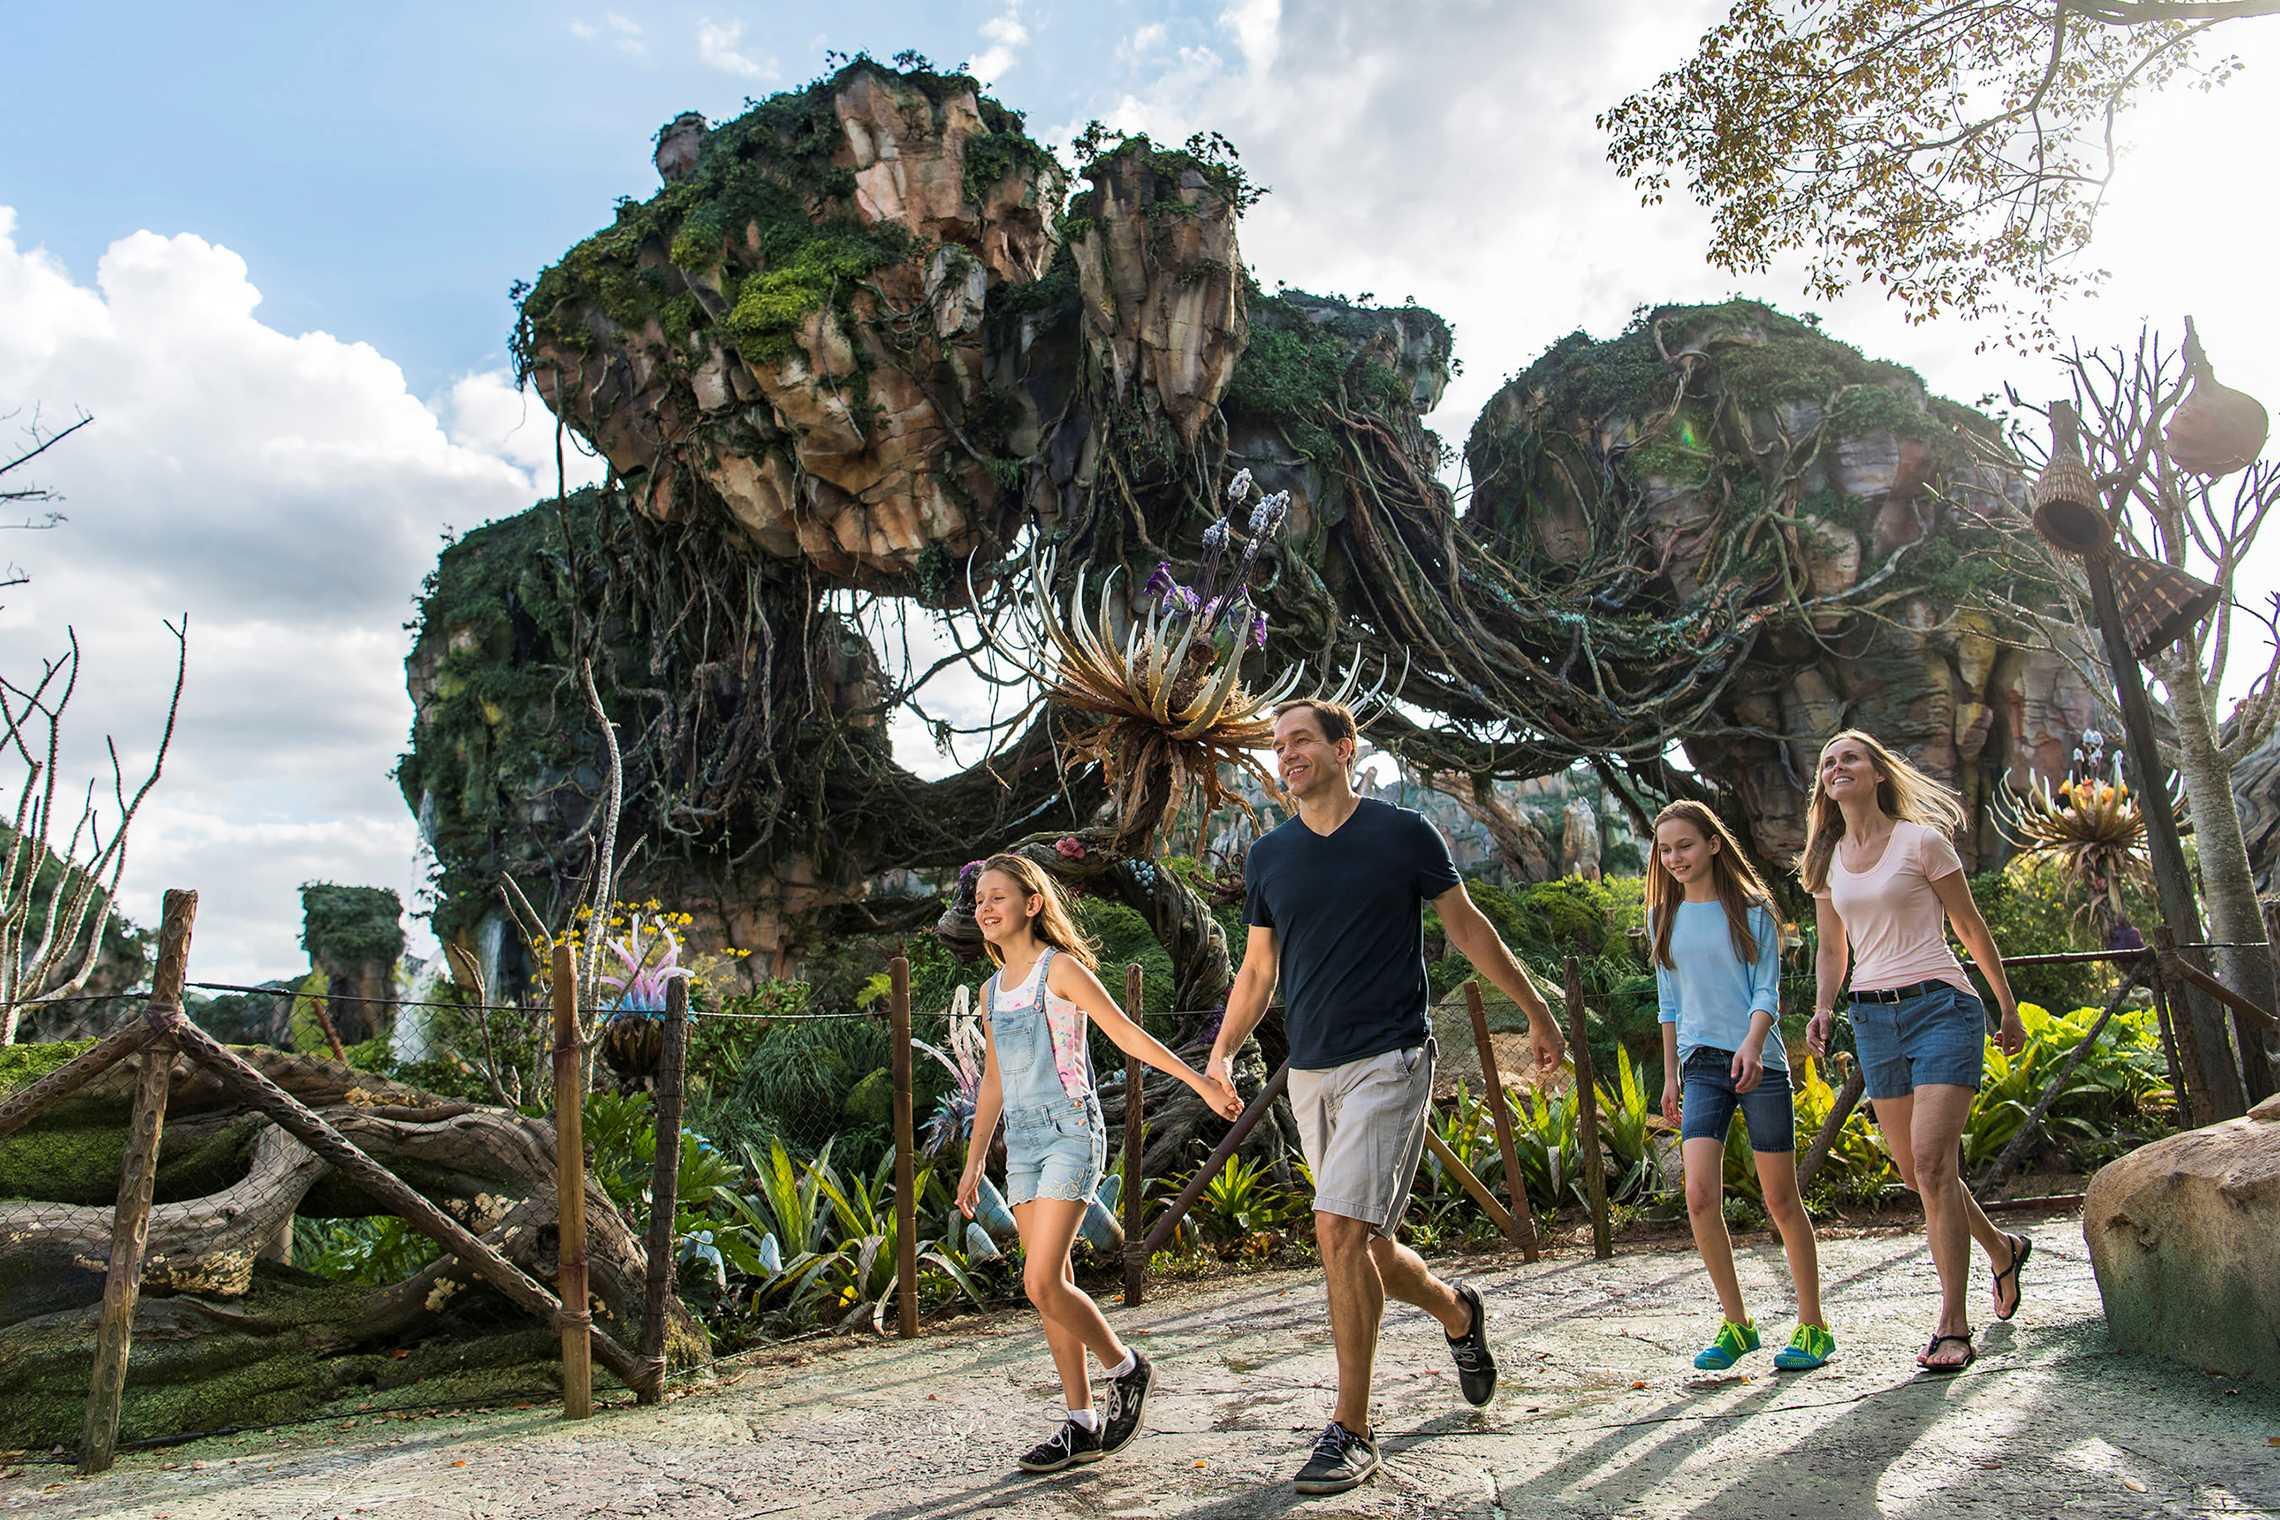 Inside Pandora - The World of Avatar. Copyright 2017 The Walt Disney Company